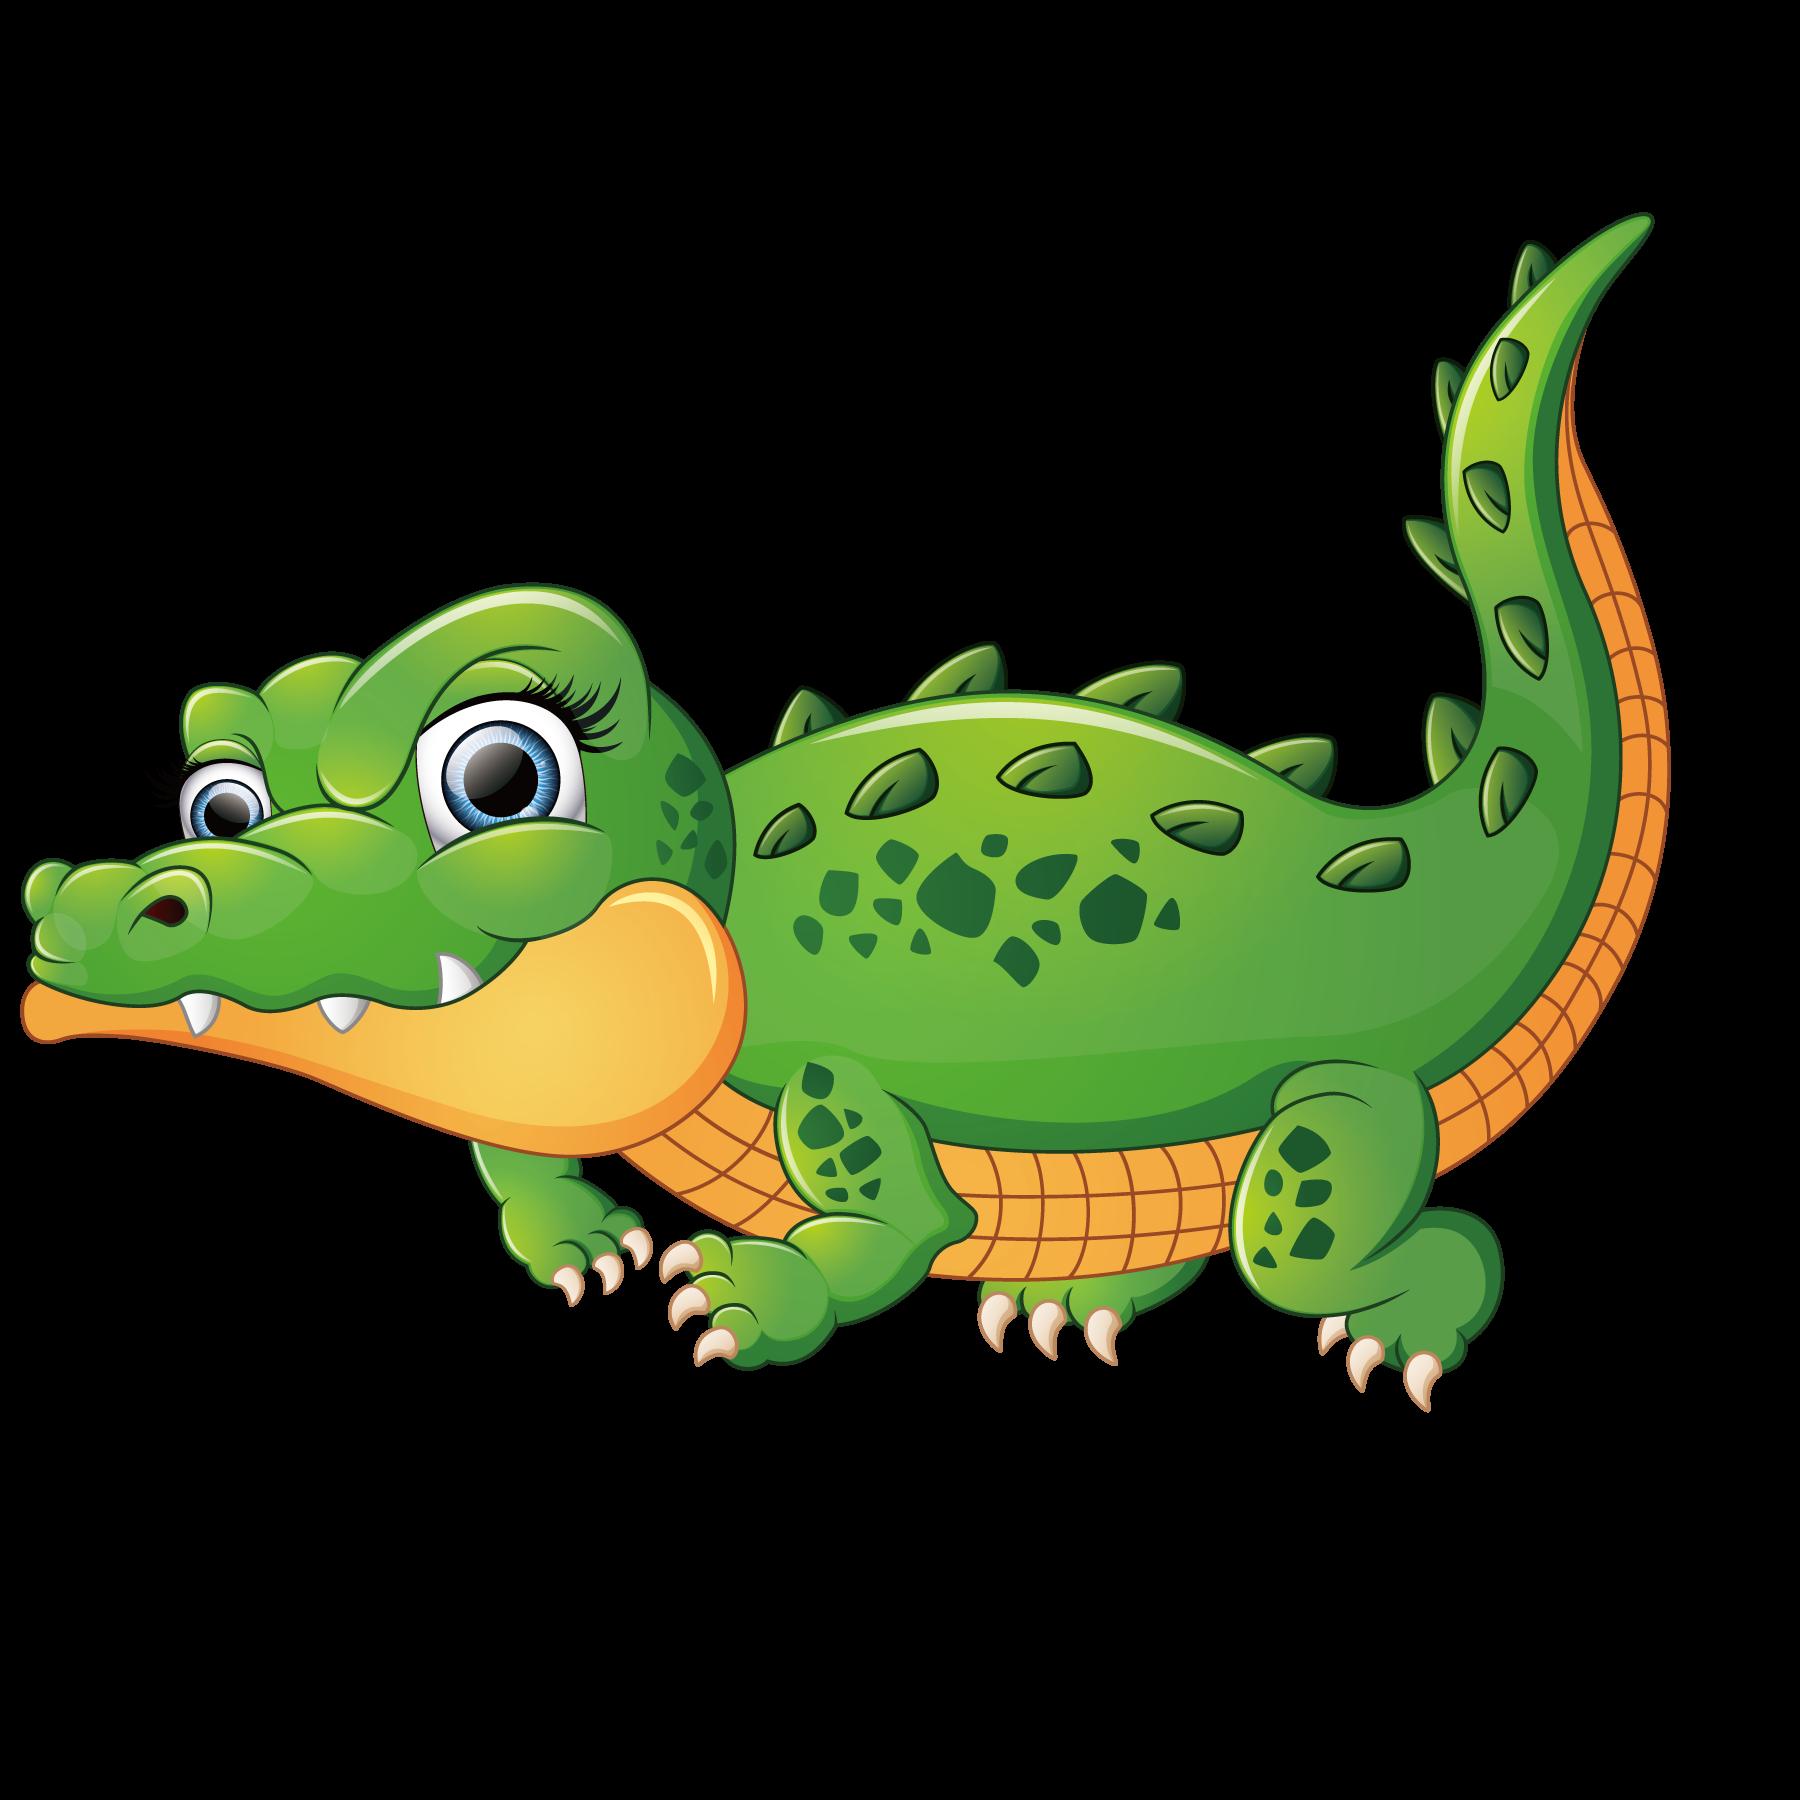 Pear clipart crocodile. Crocodiles alligator illustration cute